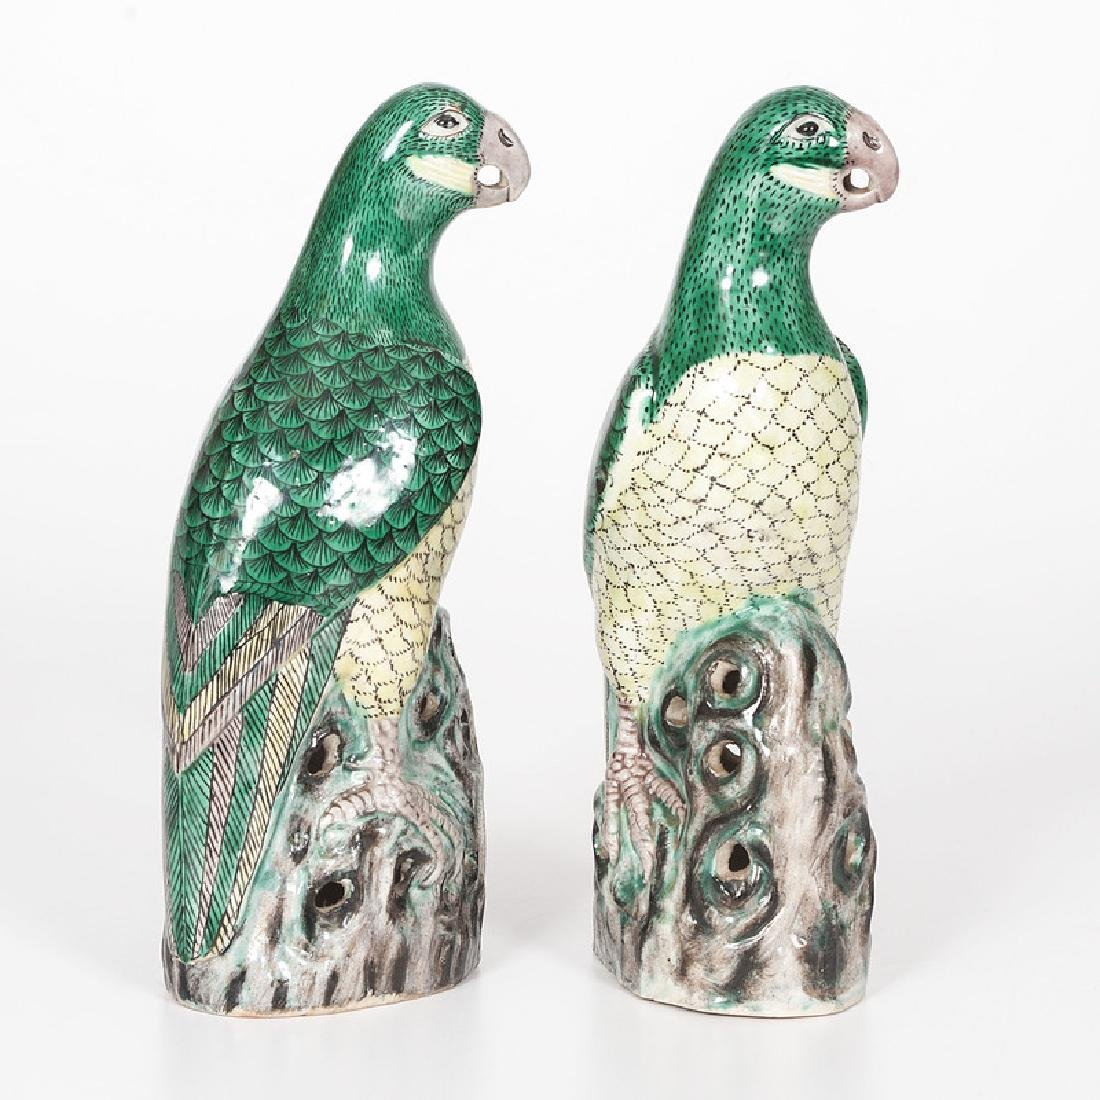 Chinese Kangxi-style Parrots - 2